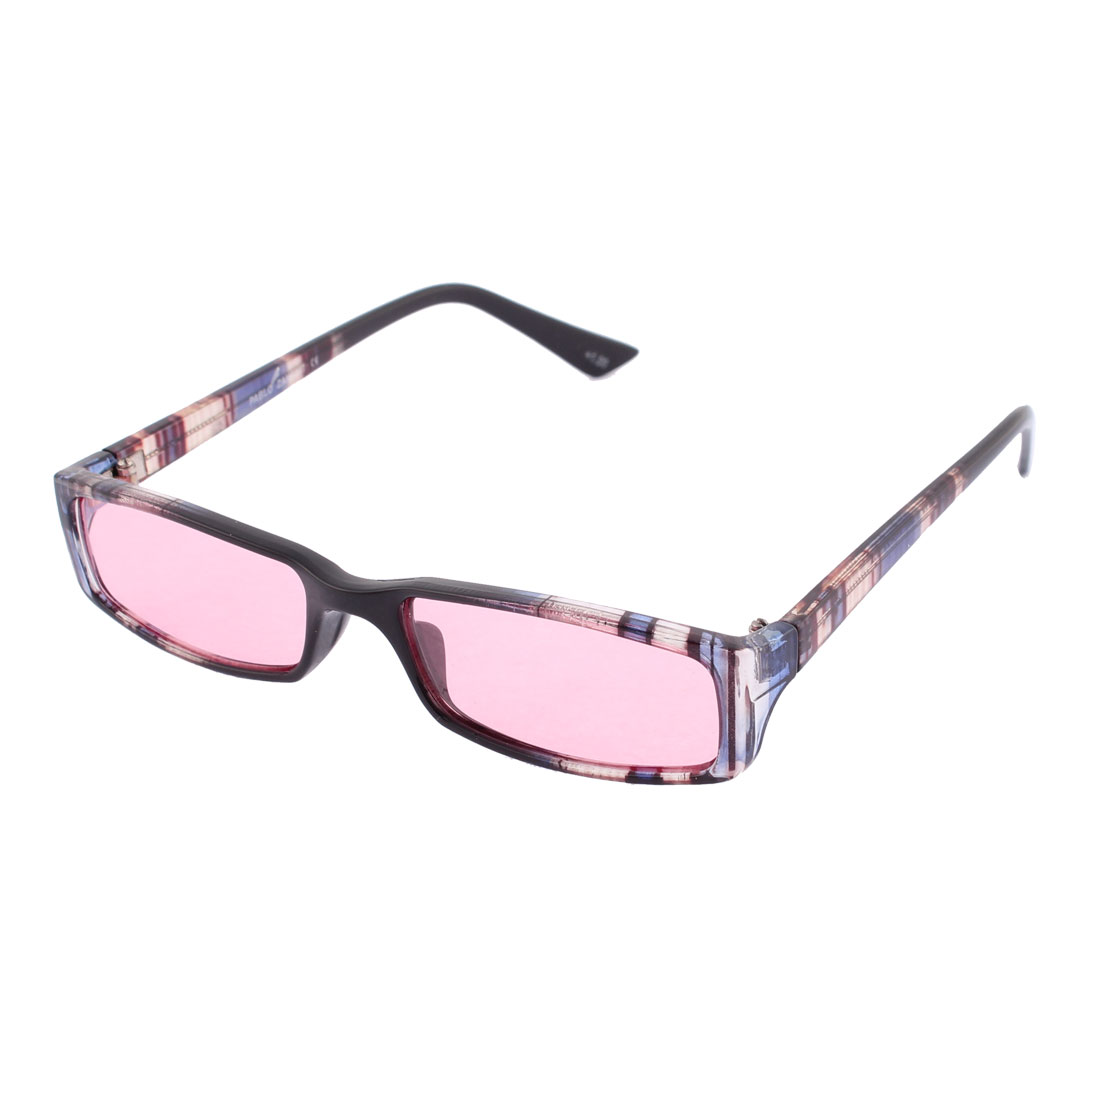 Plastic Multi-color Frame Single Bridge Red Lens Eyes Protector Sunglasses